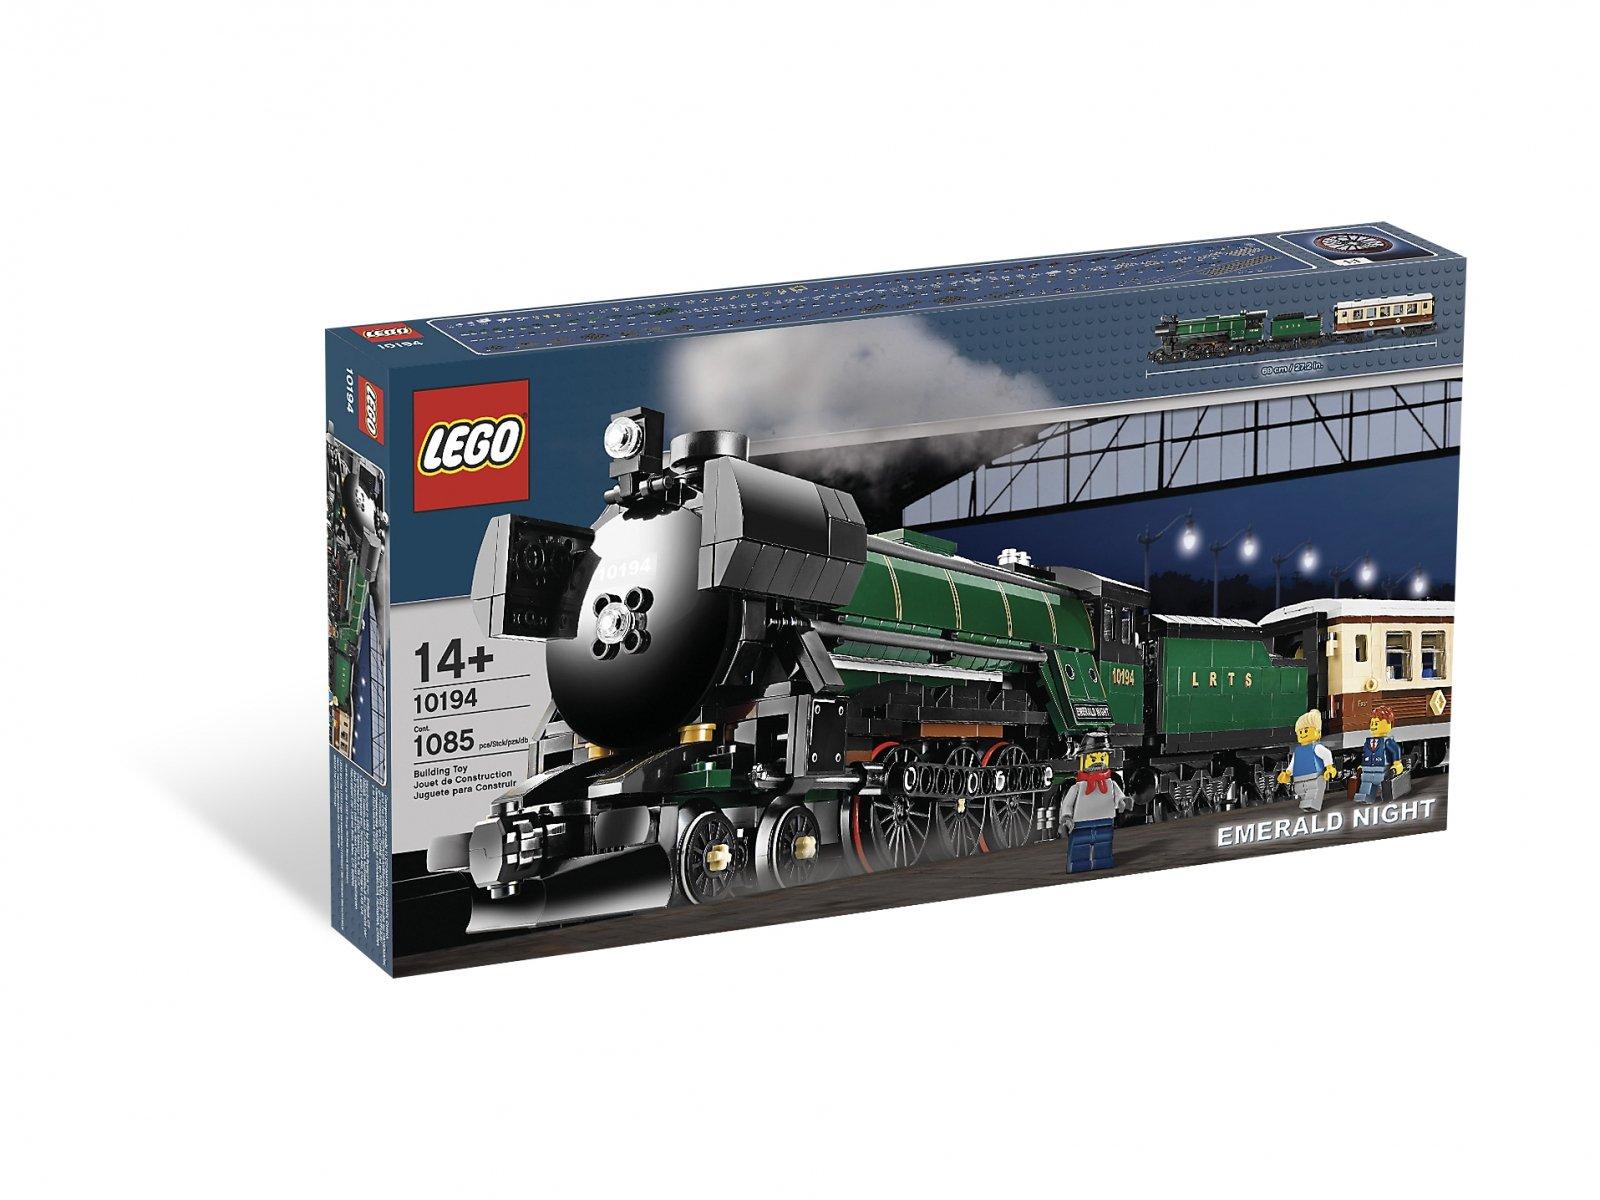 LEGO Creator Expert 10194 Emerald Night